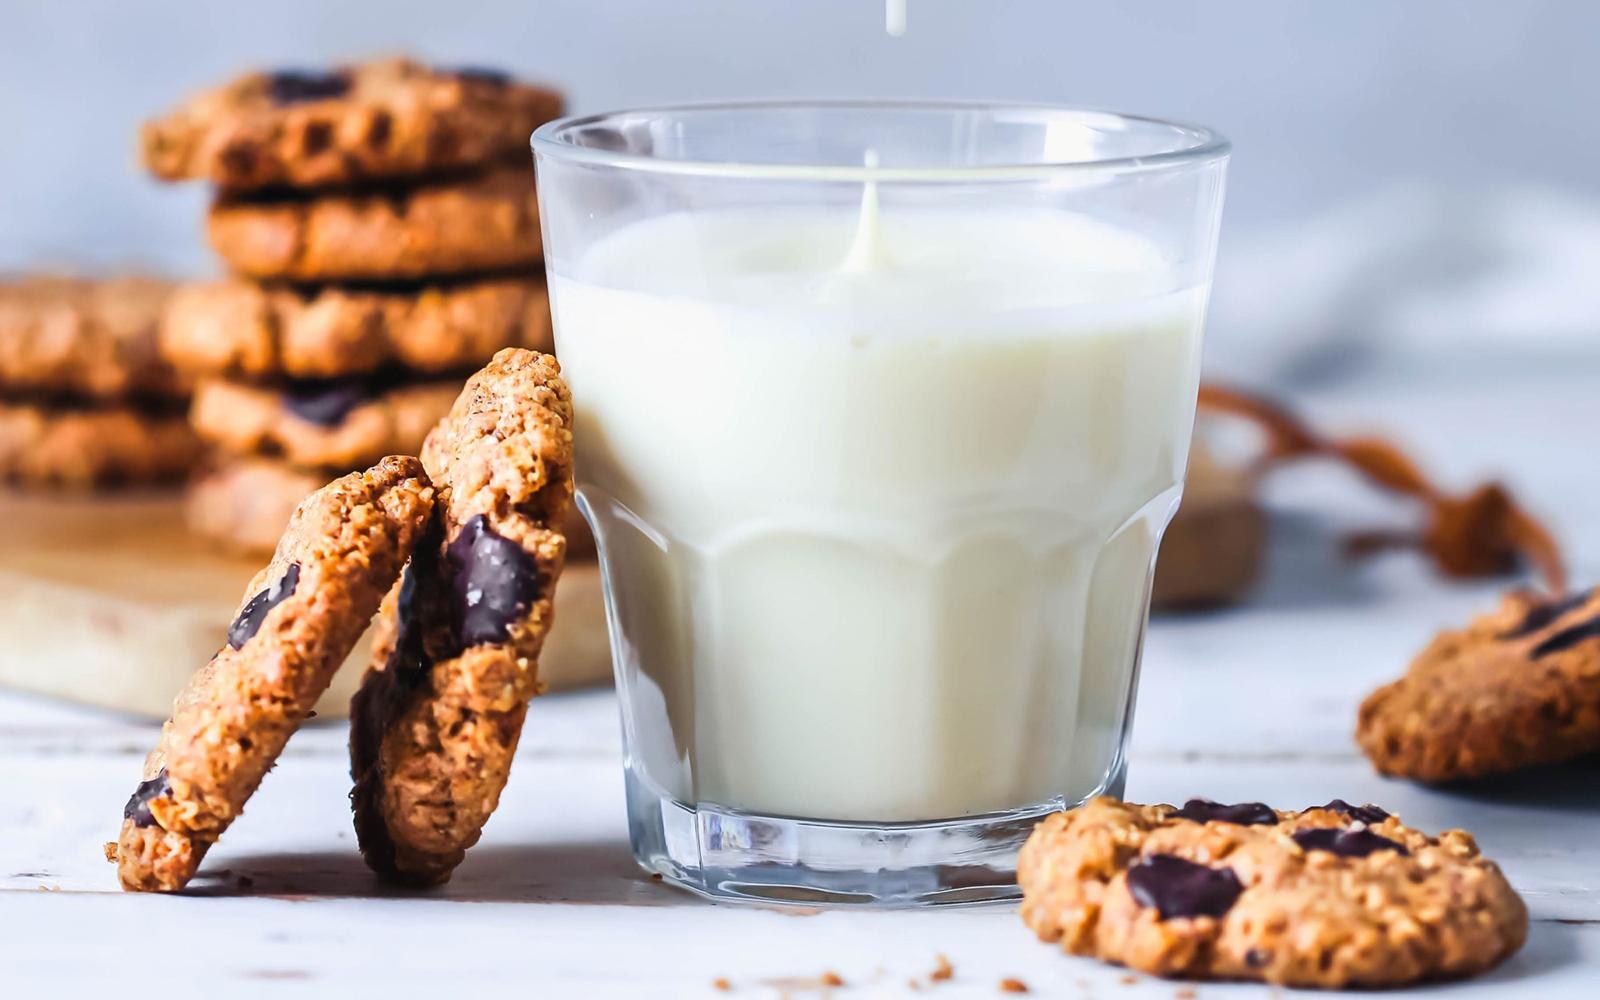 Chocolate Chip Almond Butter Cookies [Vegan, Gluten-Free]